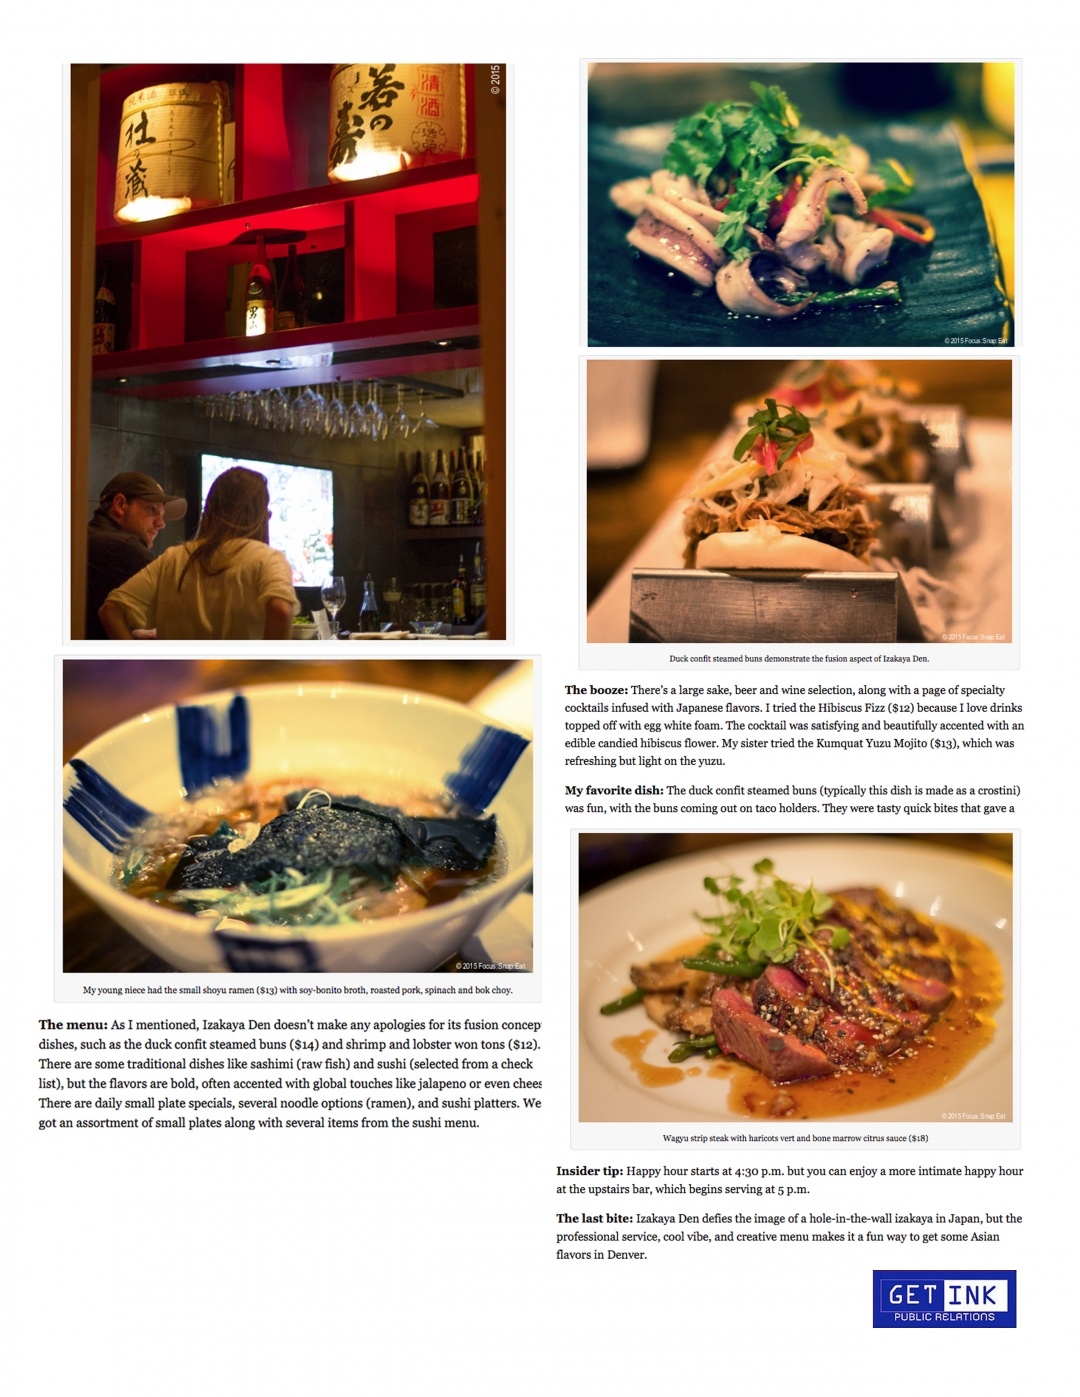 Focus Snap Eat Izakaya Den Clip 6.18.15 page2